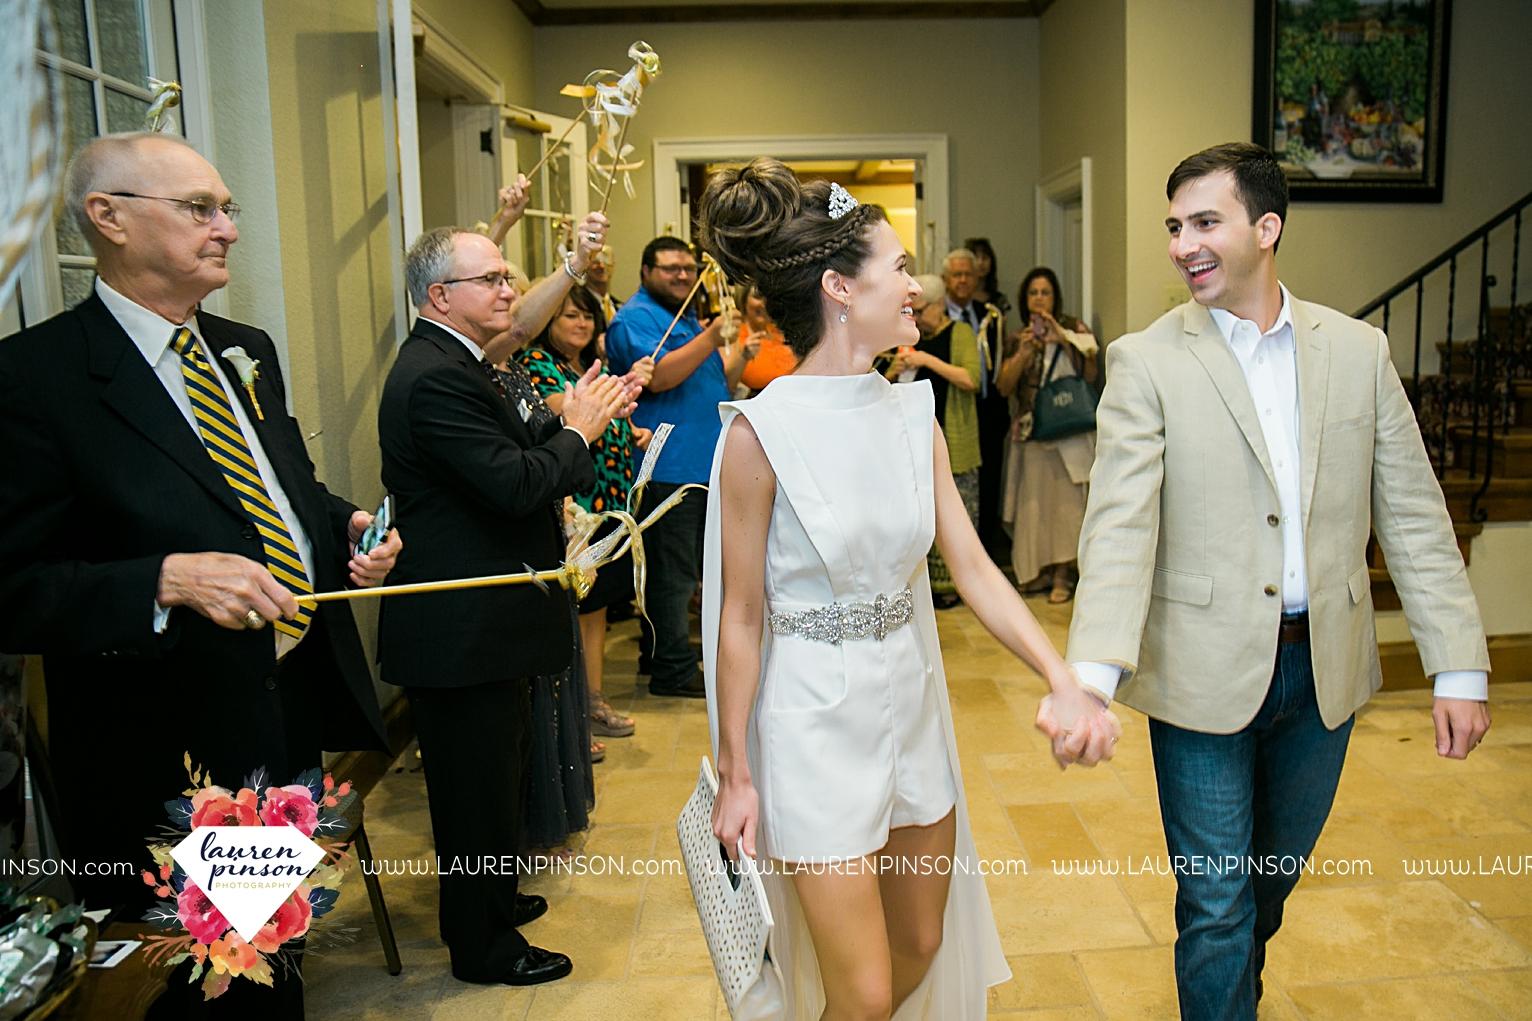 wichita-falls-texas-wedding-photographer-the-forum-by-the-kemp-mayfield-events-ulta-gold-glitter_2881.jpg